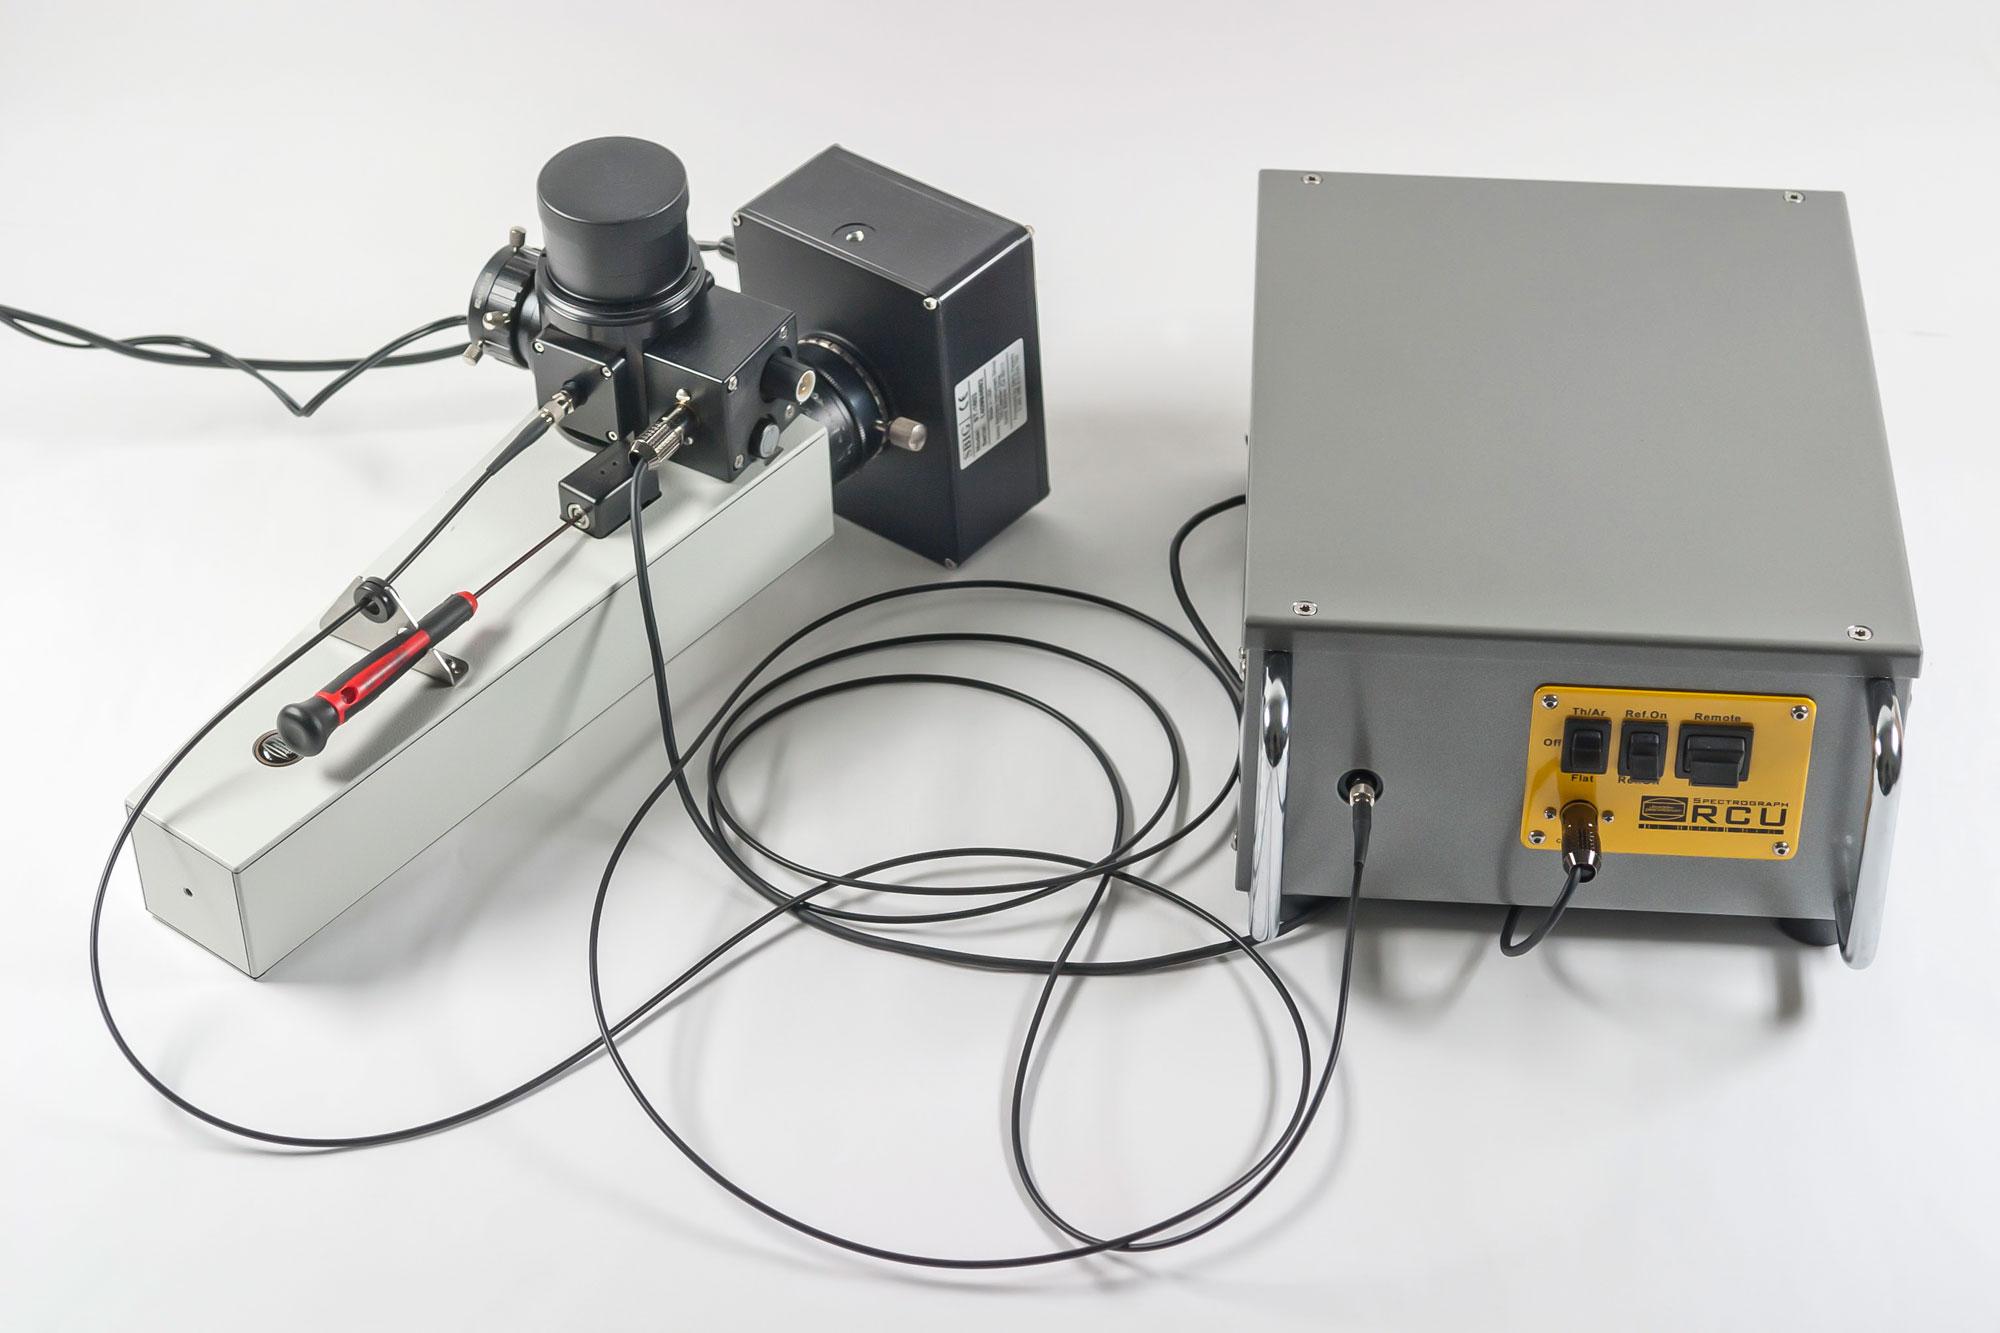 Baader BACHES Echelle-Spektrograf